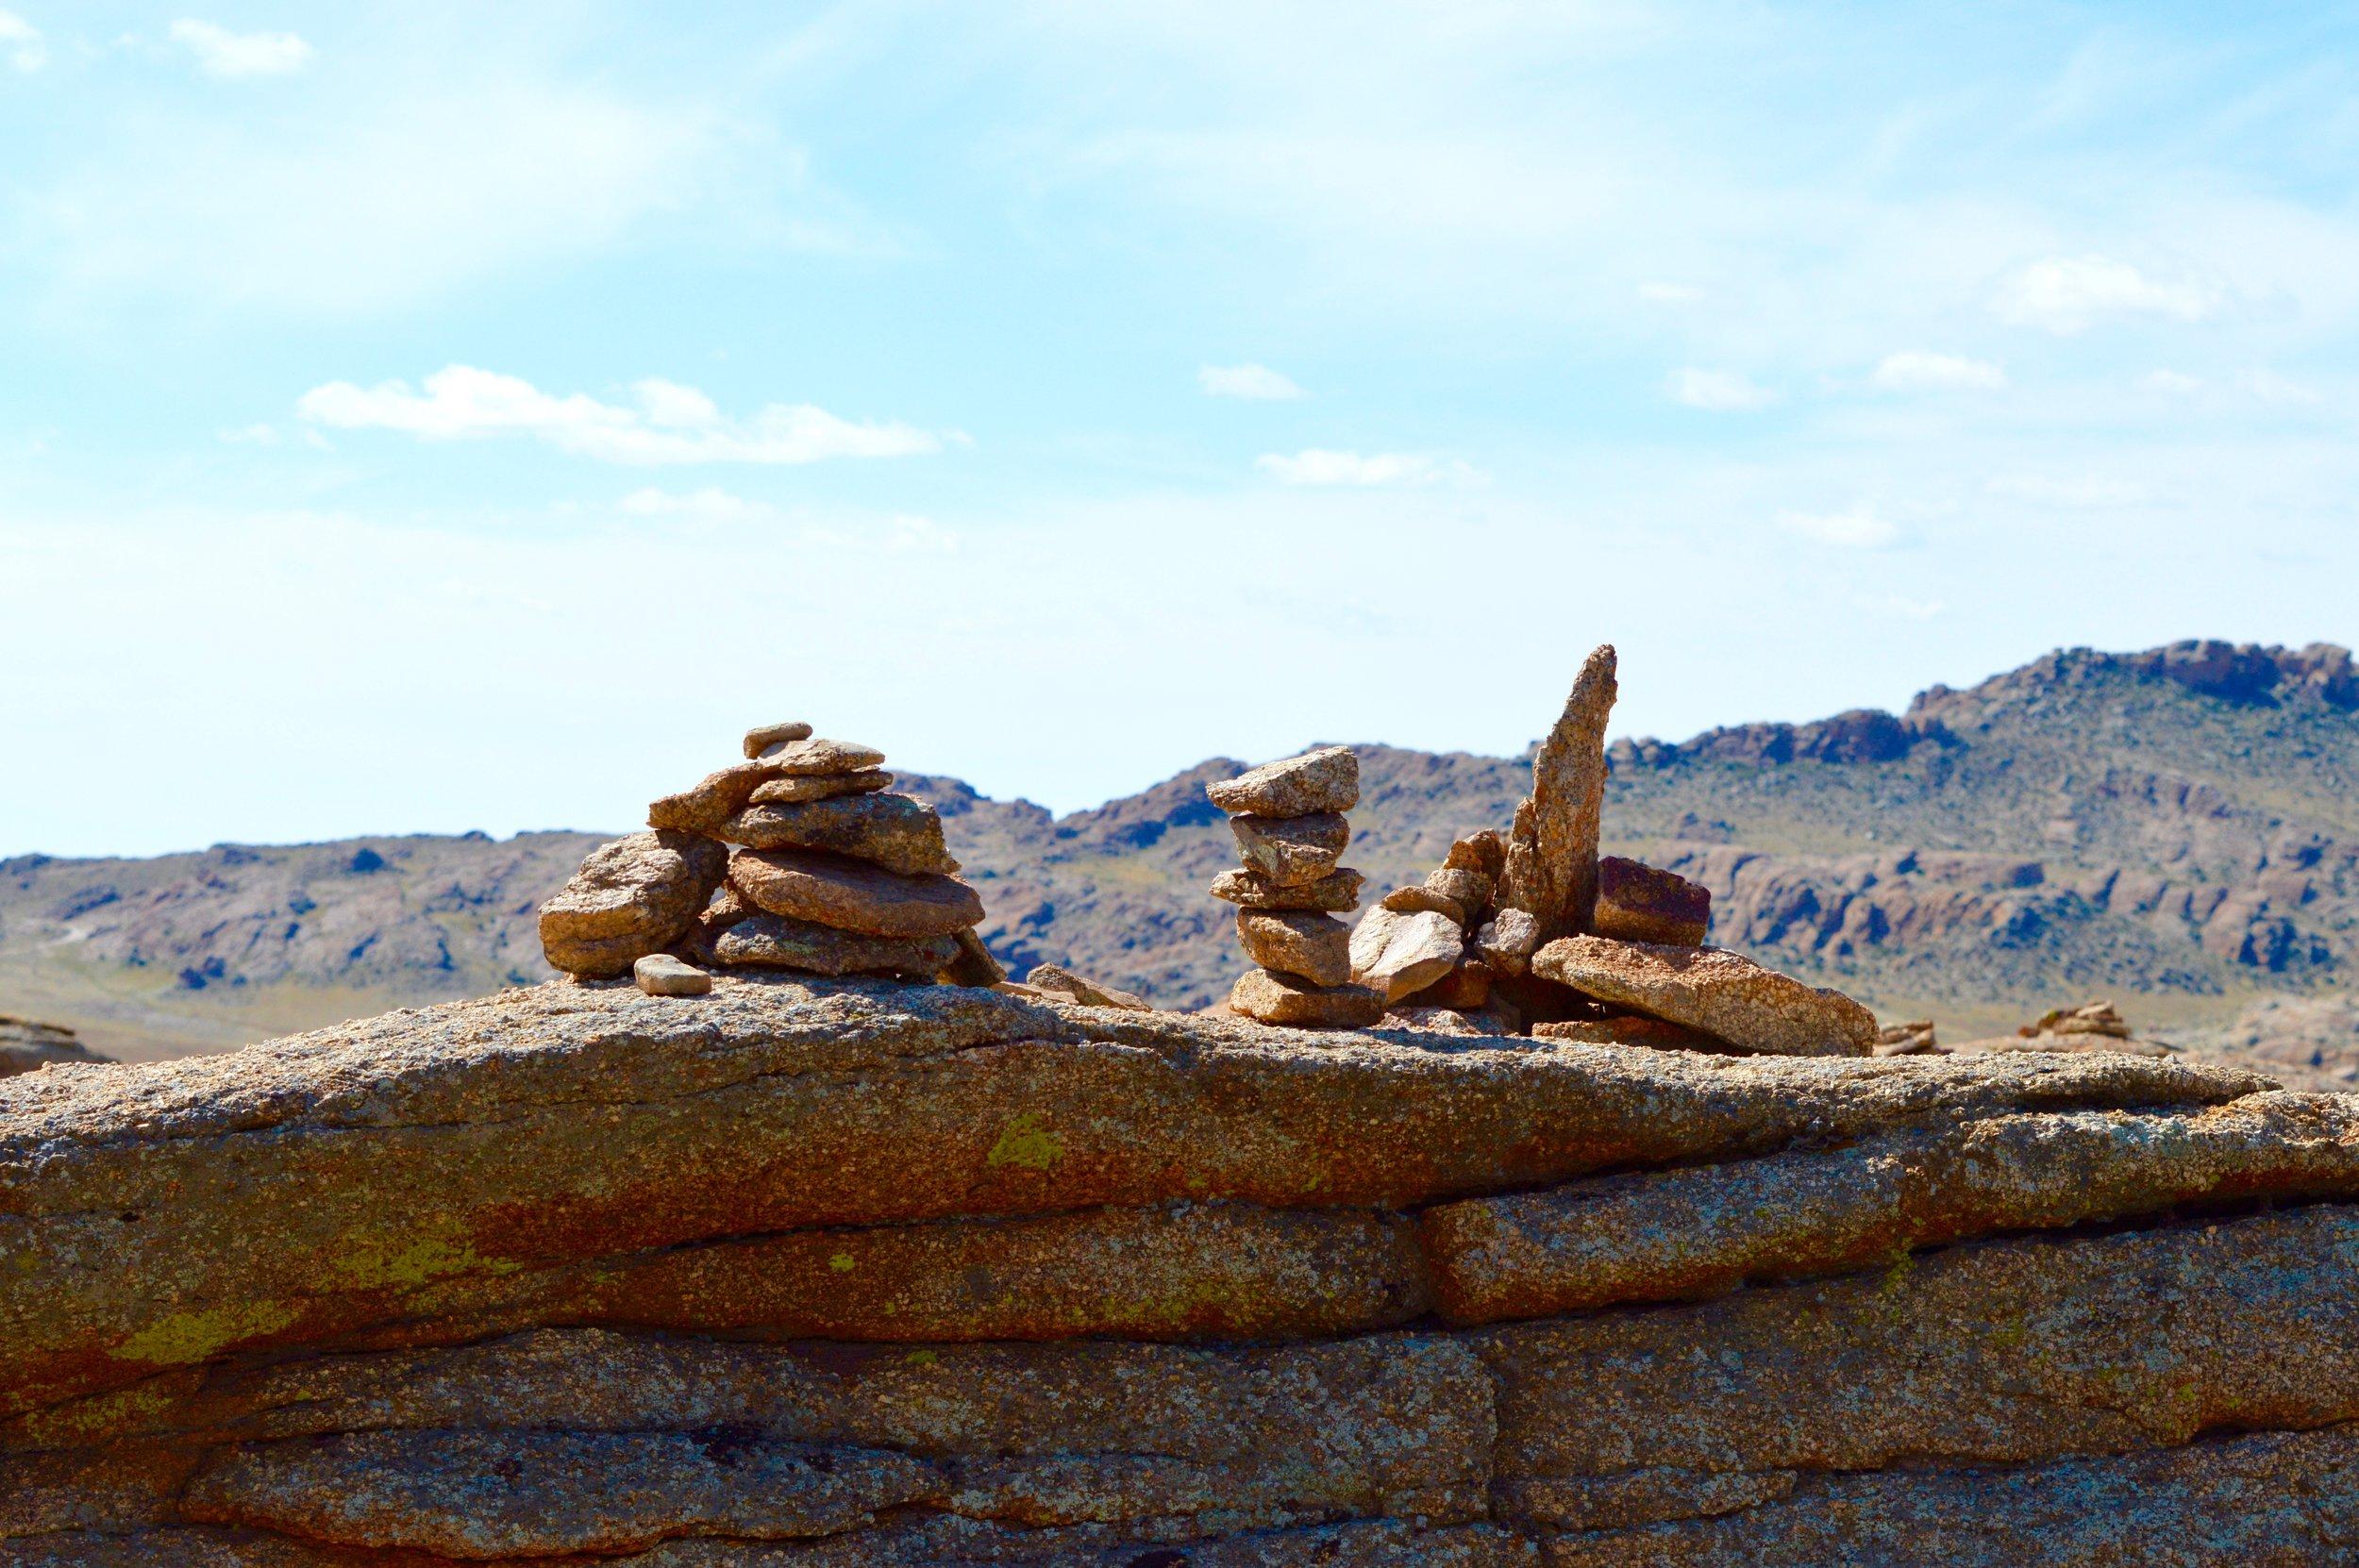 Ovoos - sacred stacks of rocks